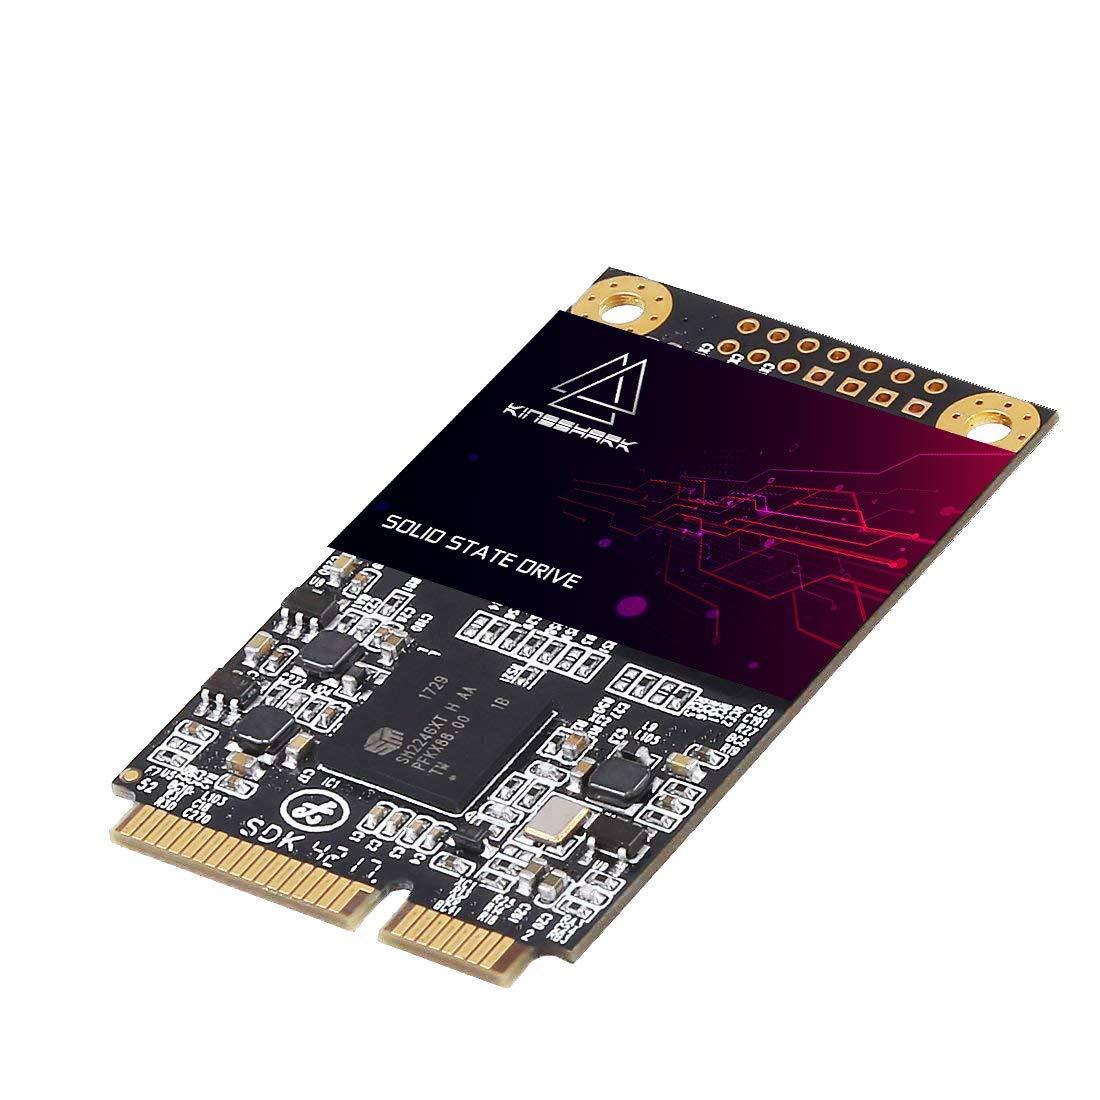 KingShark Msata SSD 480GB mSATA SSD 30 * 50MM Unidad de Estado ...